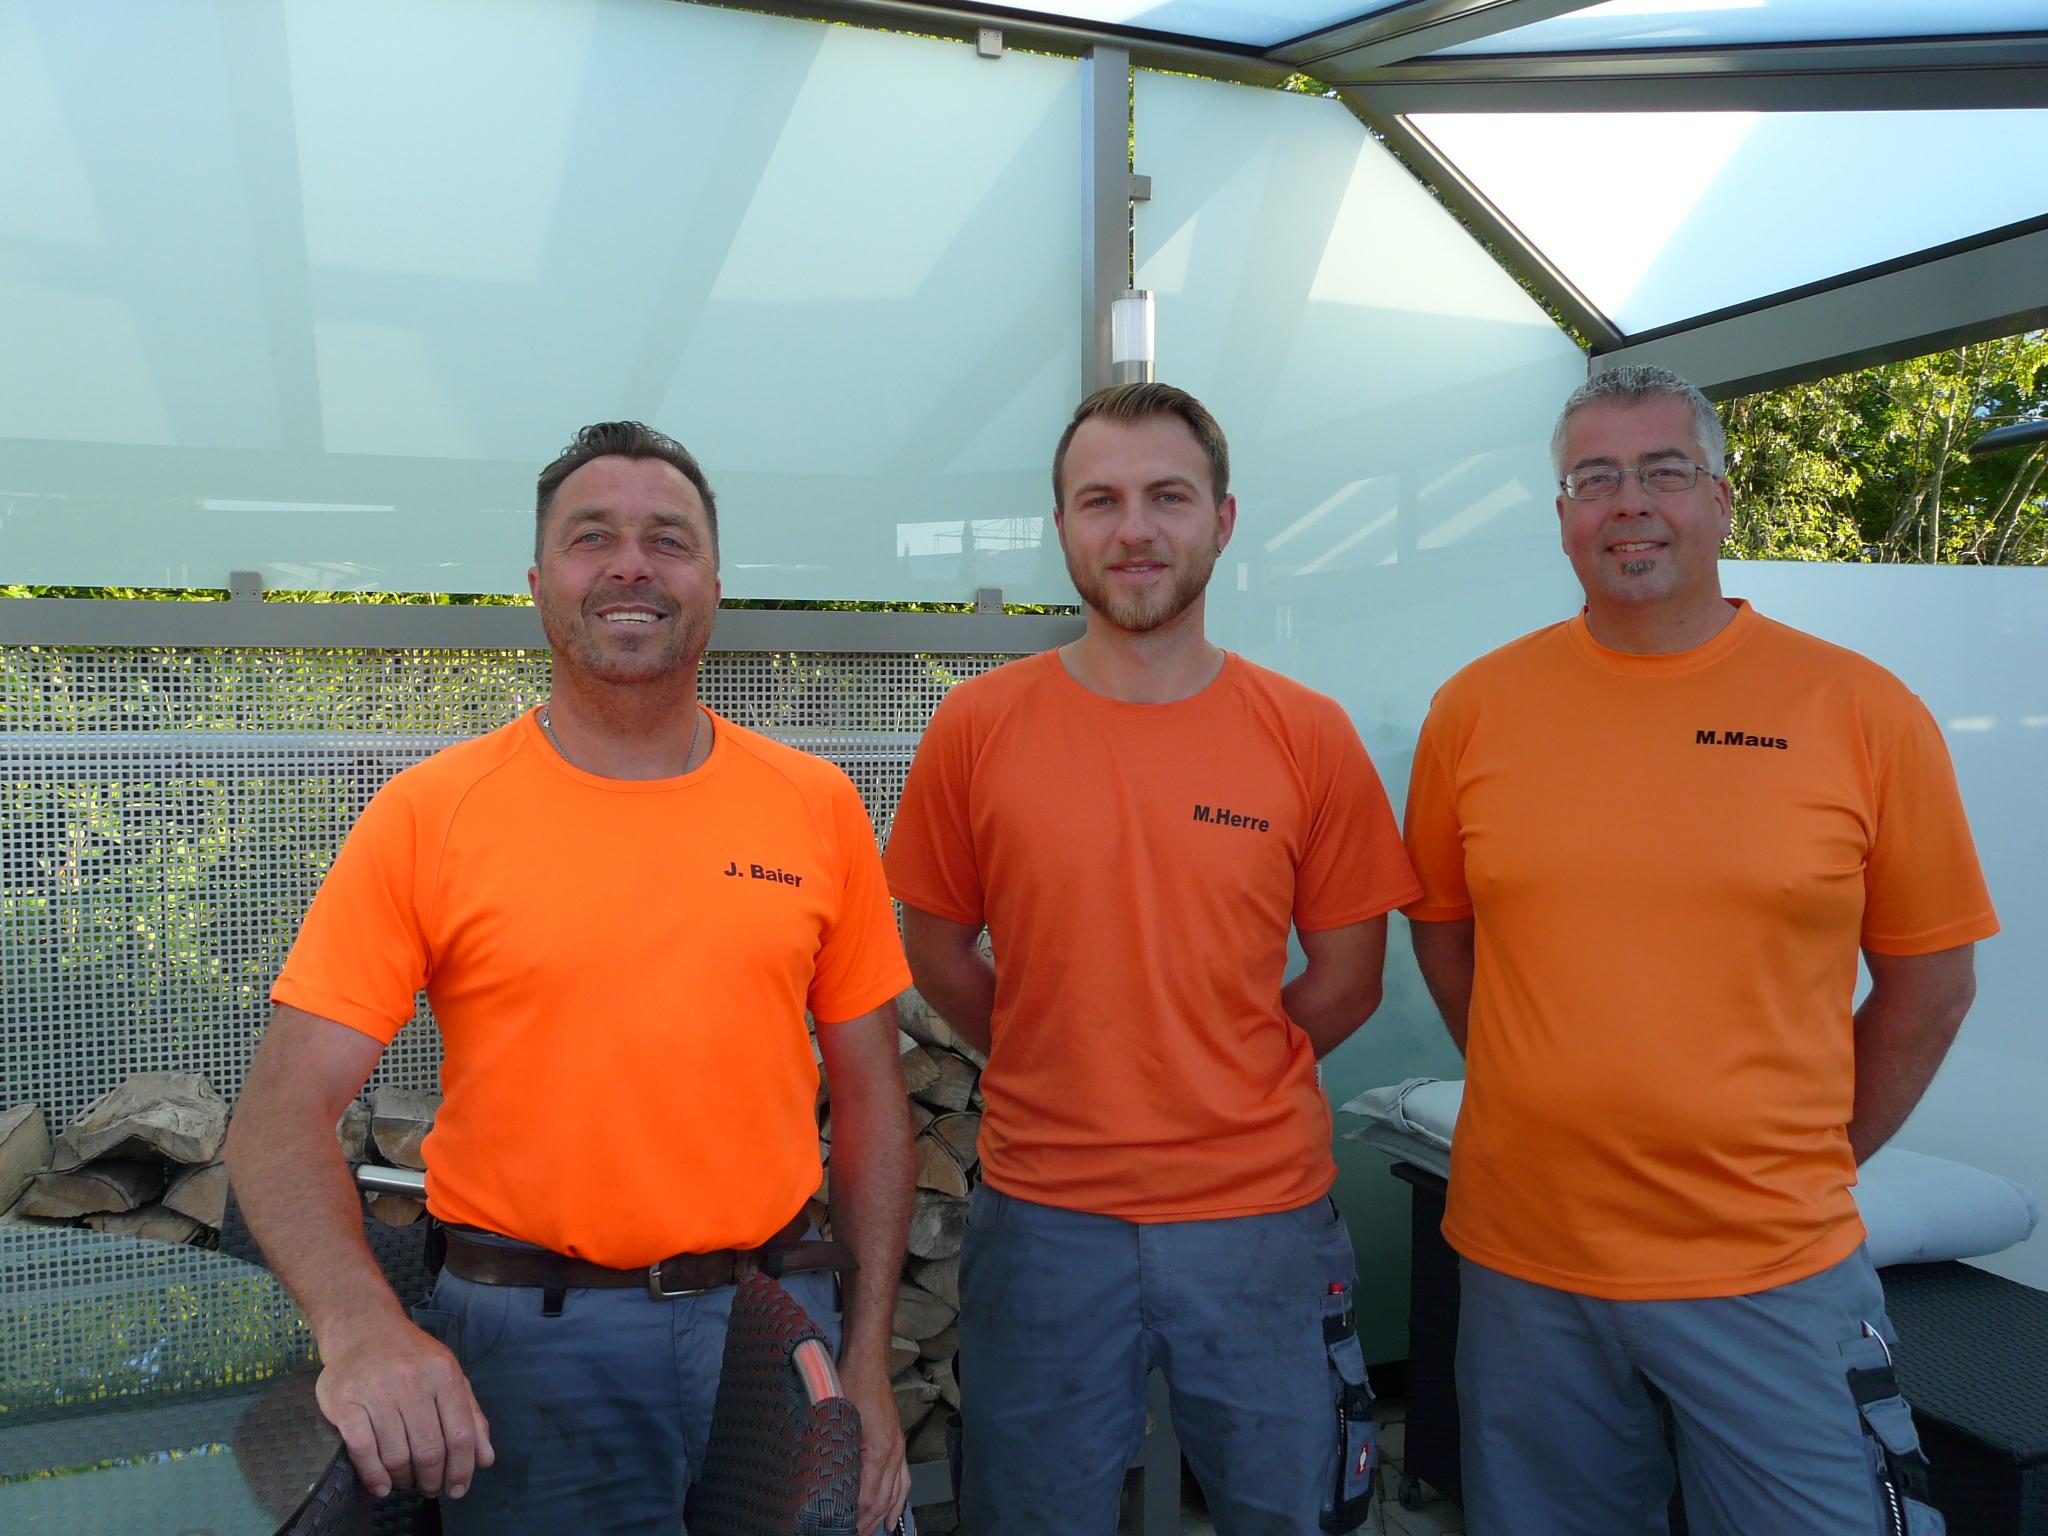 Monteur Team